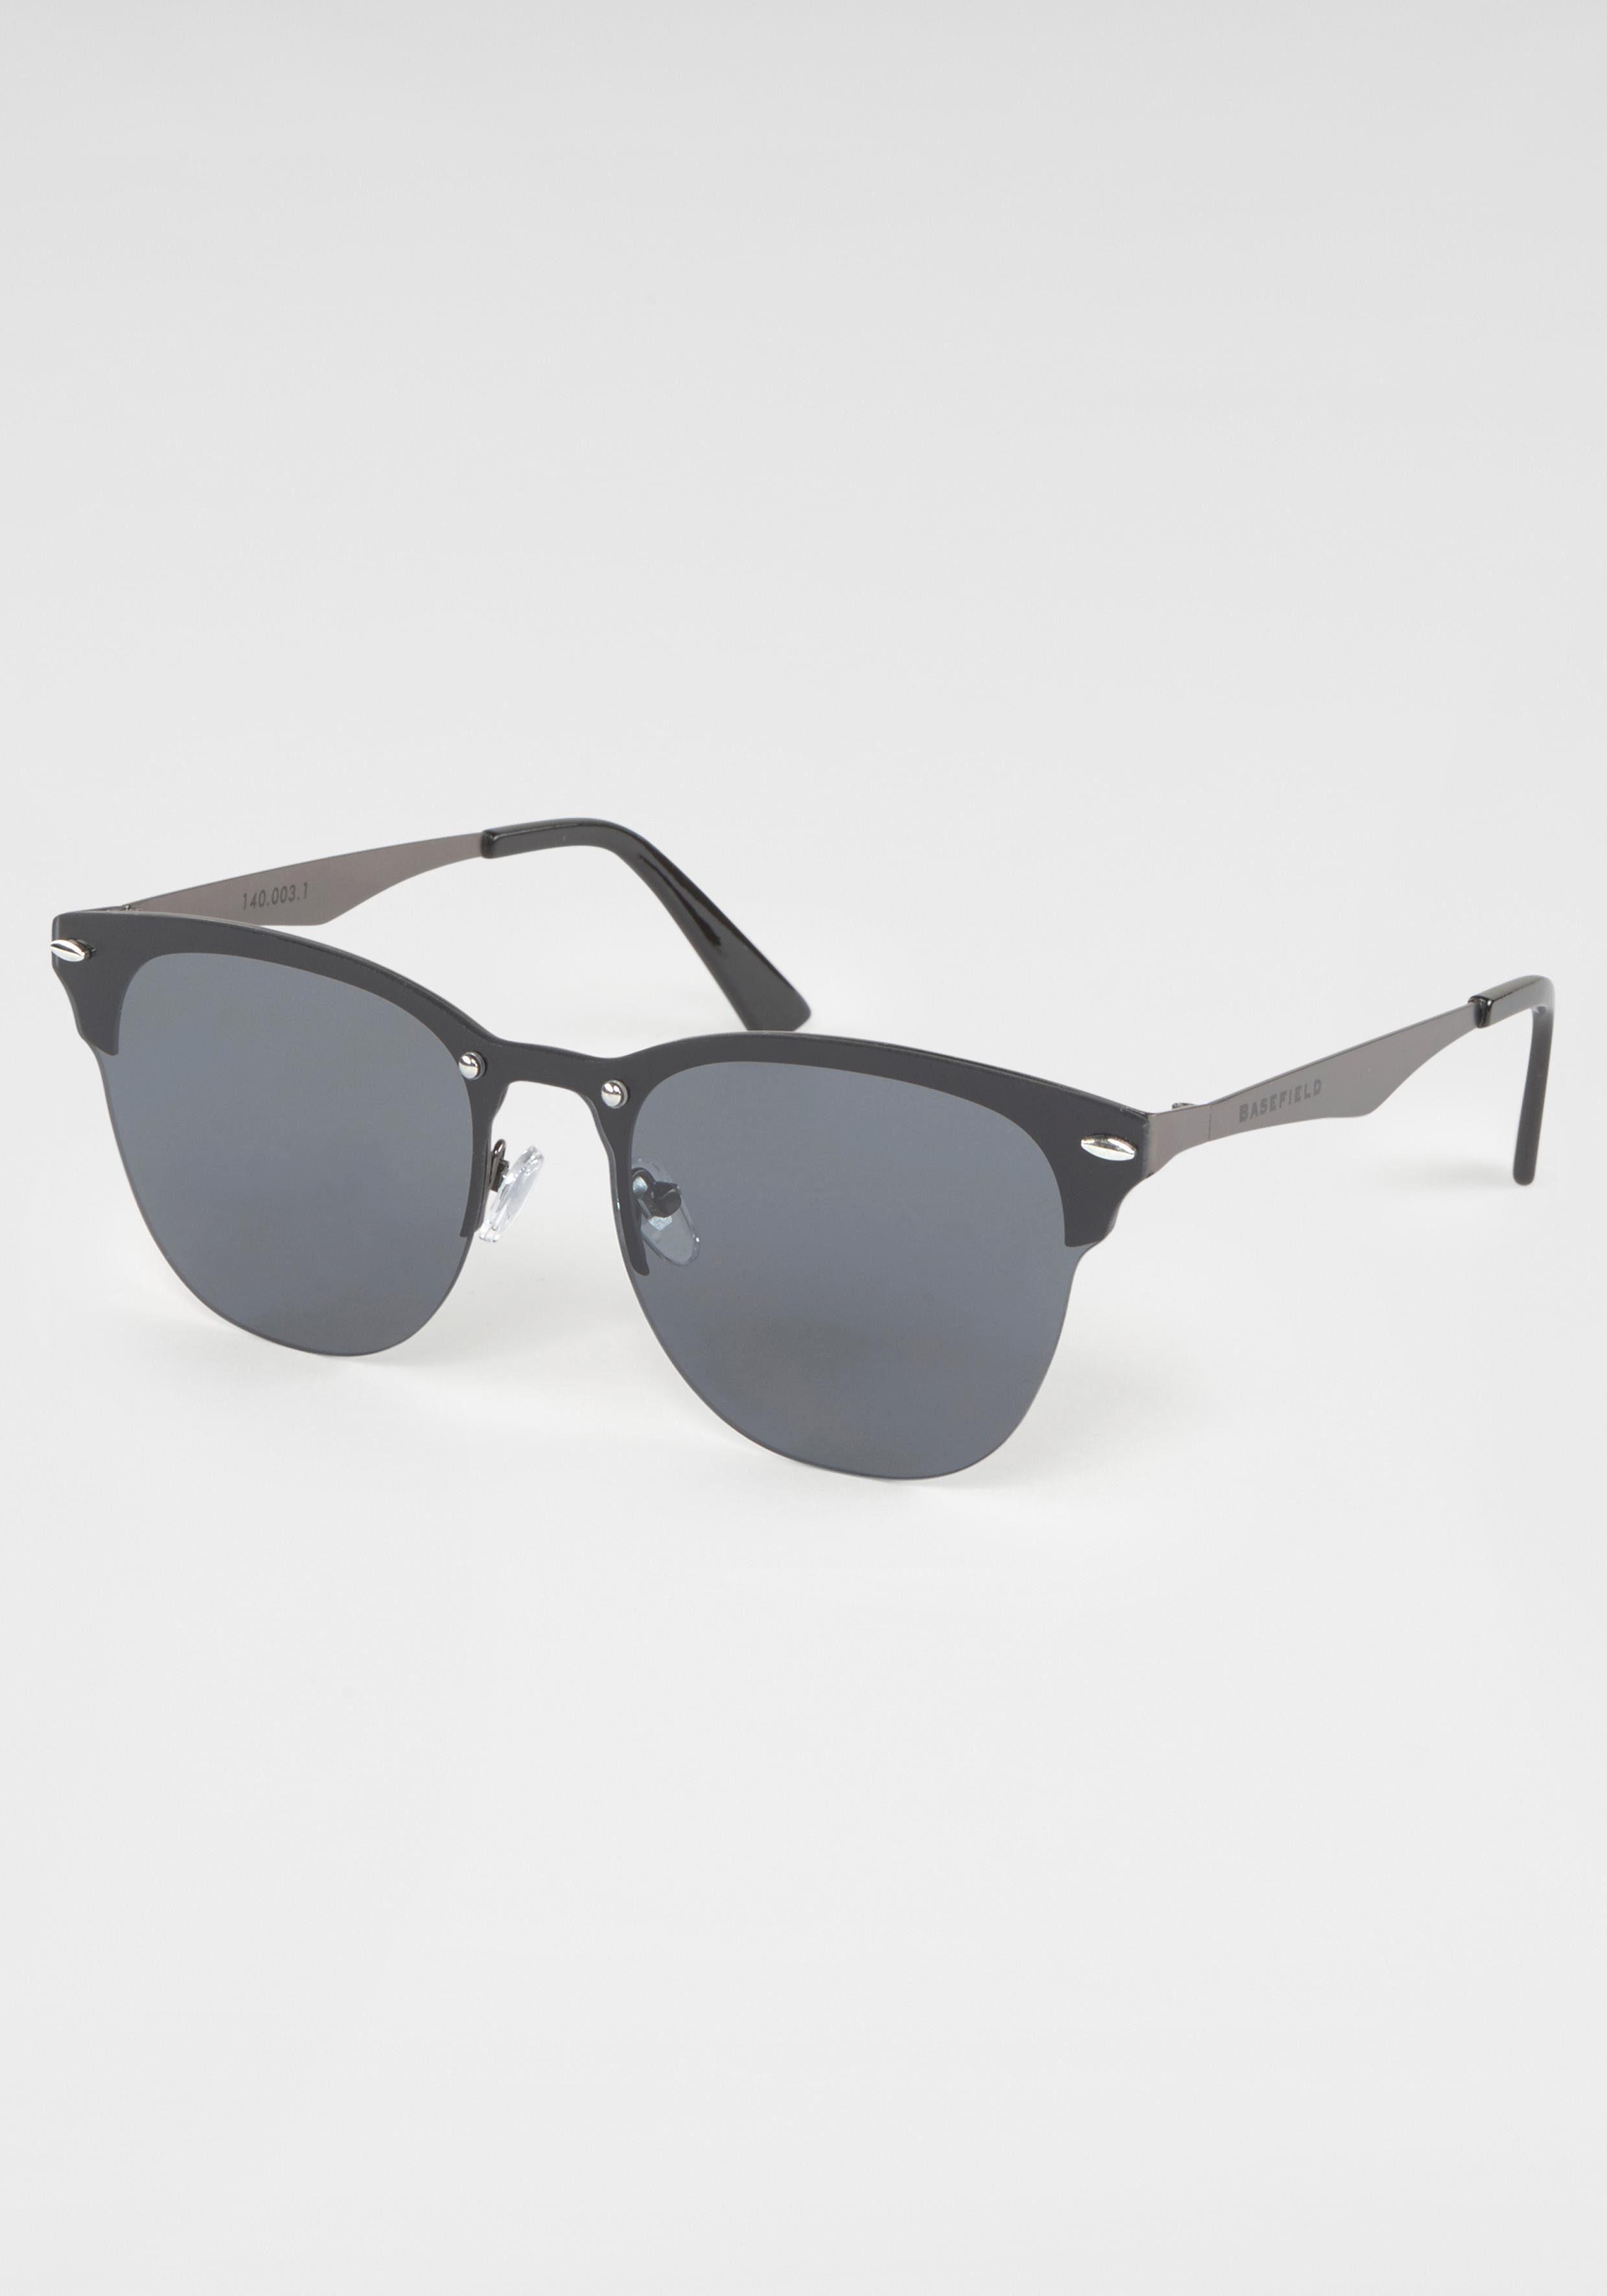 BASEFIELD Retrosonnenbrille (1-St) Damen Sonnenbrille, Clubmaster Style